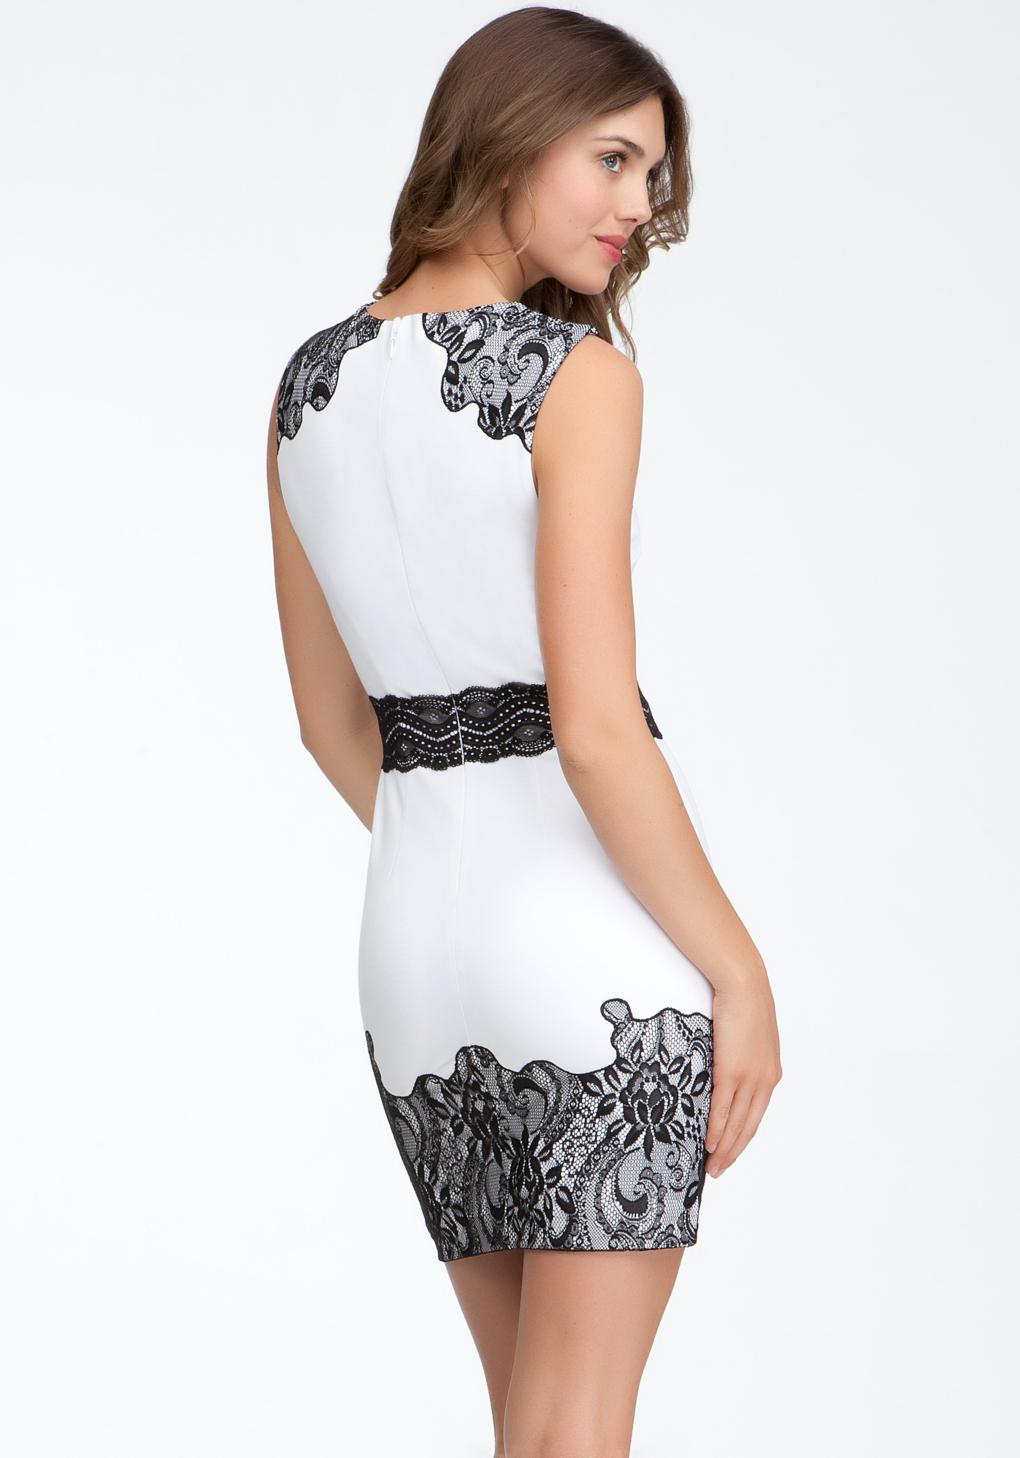 ff532d9e44 White And Black Dress Bebe – Little Black Dress   Black Lace ...